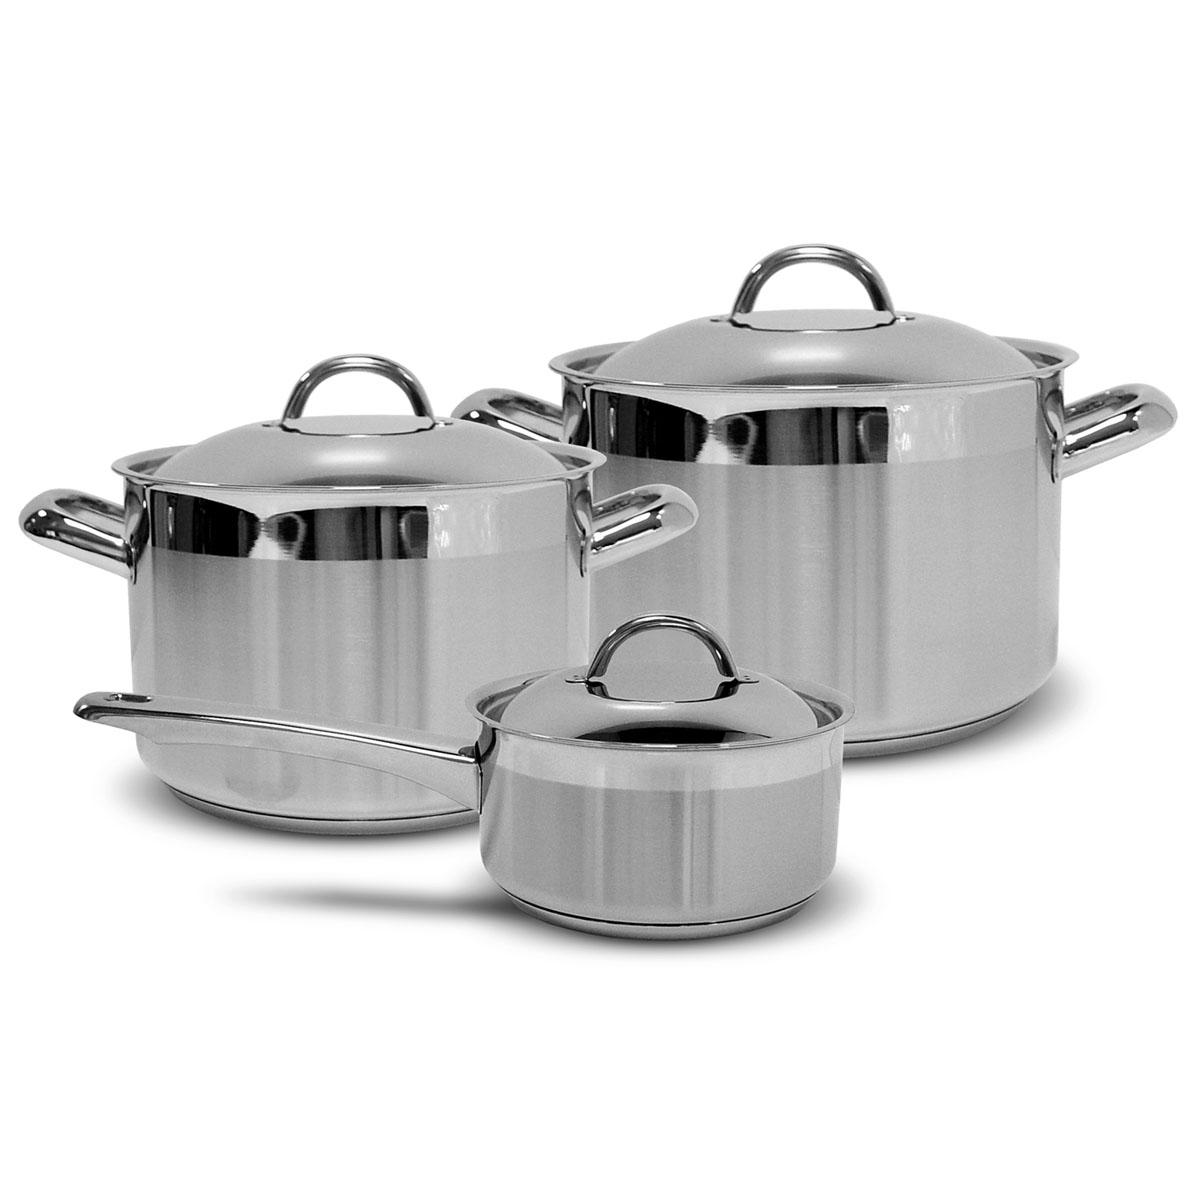 Набор посуды Silampos Европа, 6 предметов632123BM0217632123BM0217 Набор 3пр.ЕВРОПА Характеристики: Материал: сталь.Размер: 330*300*210мм.Артикул: 632123BM0217.